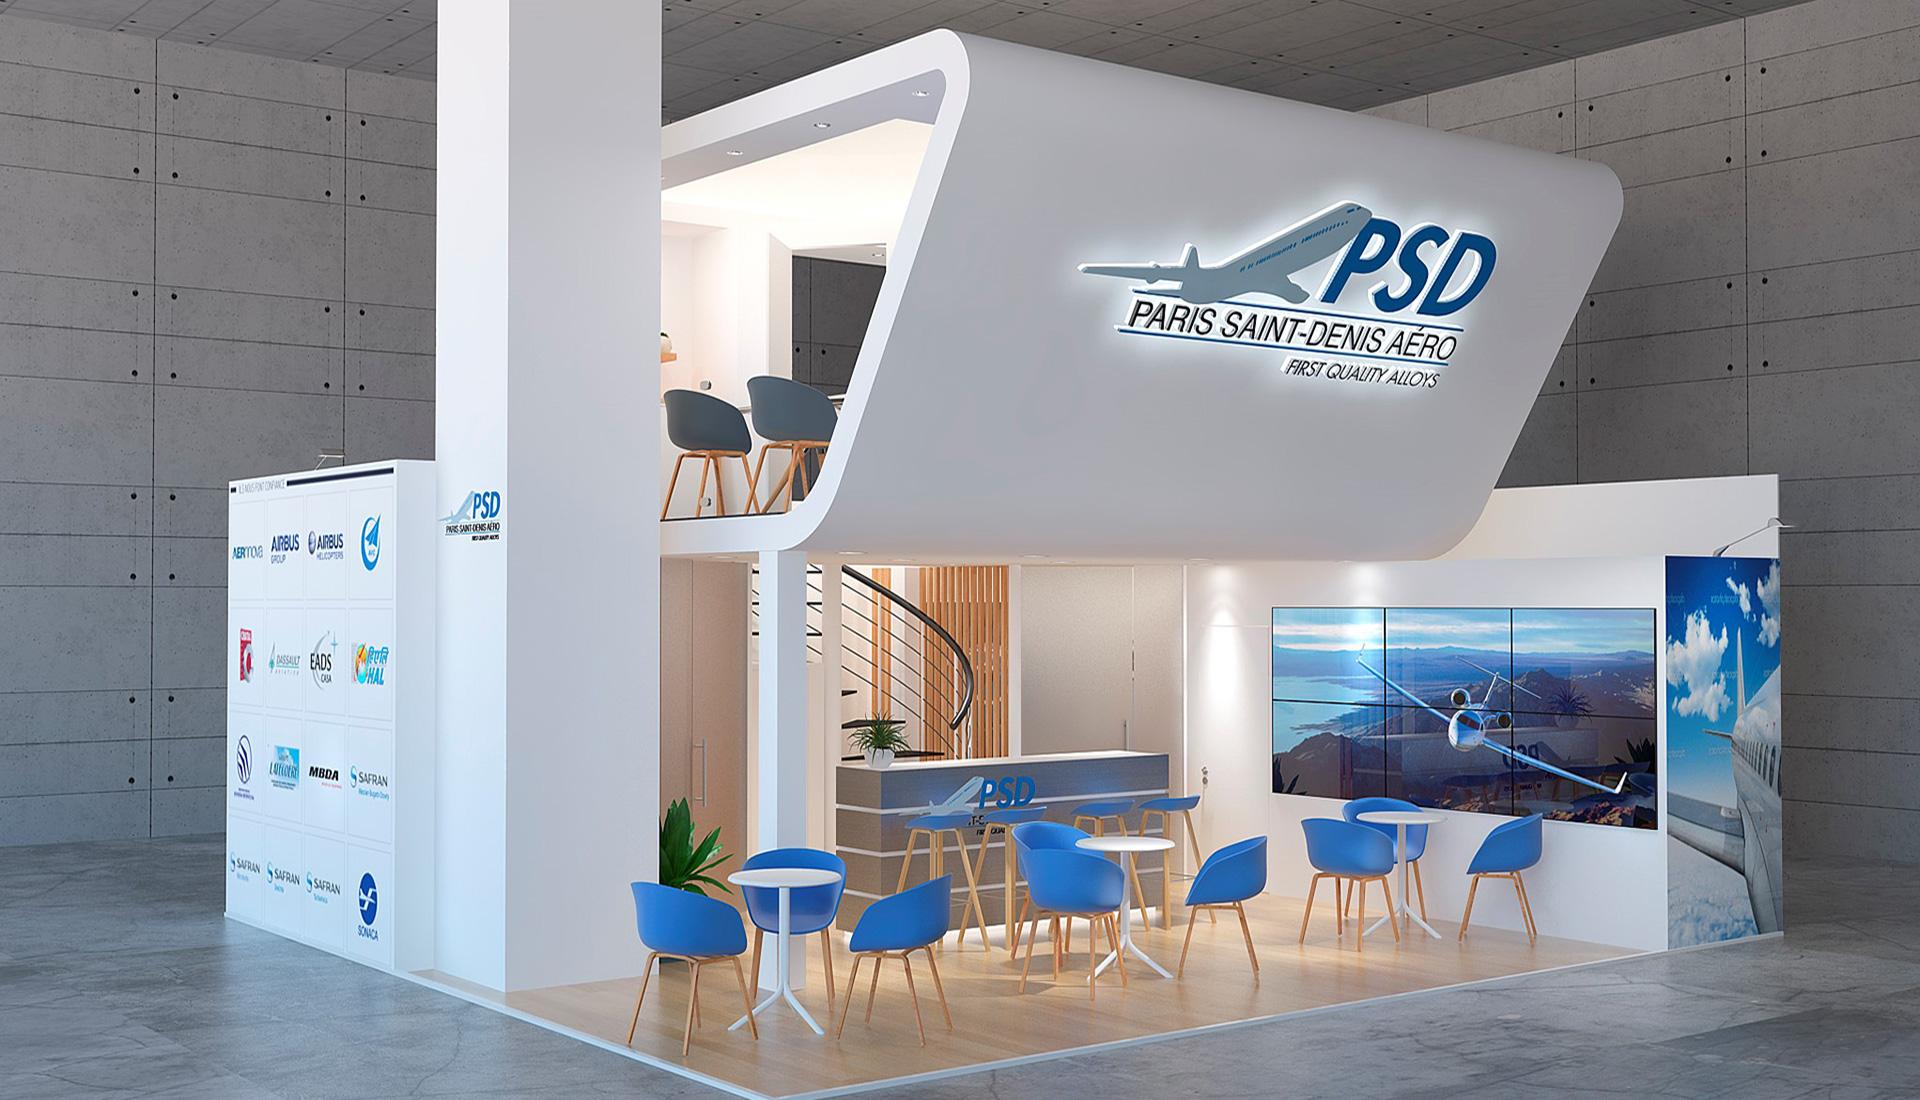 Design du stand PSD au salon SIAE